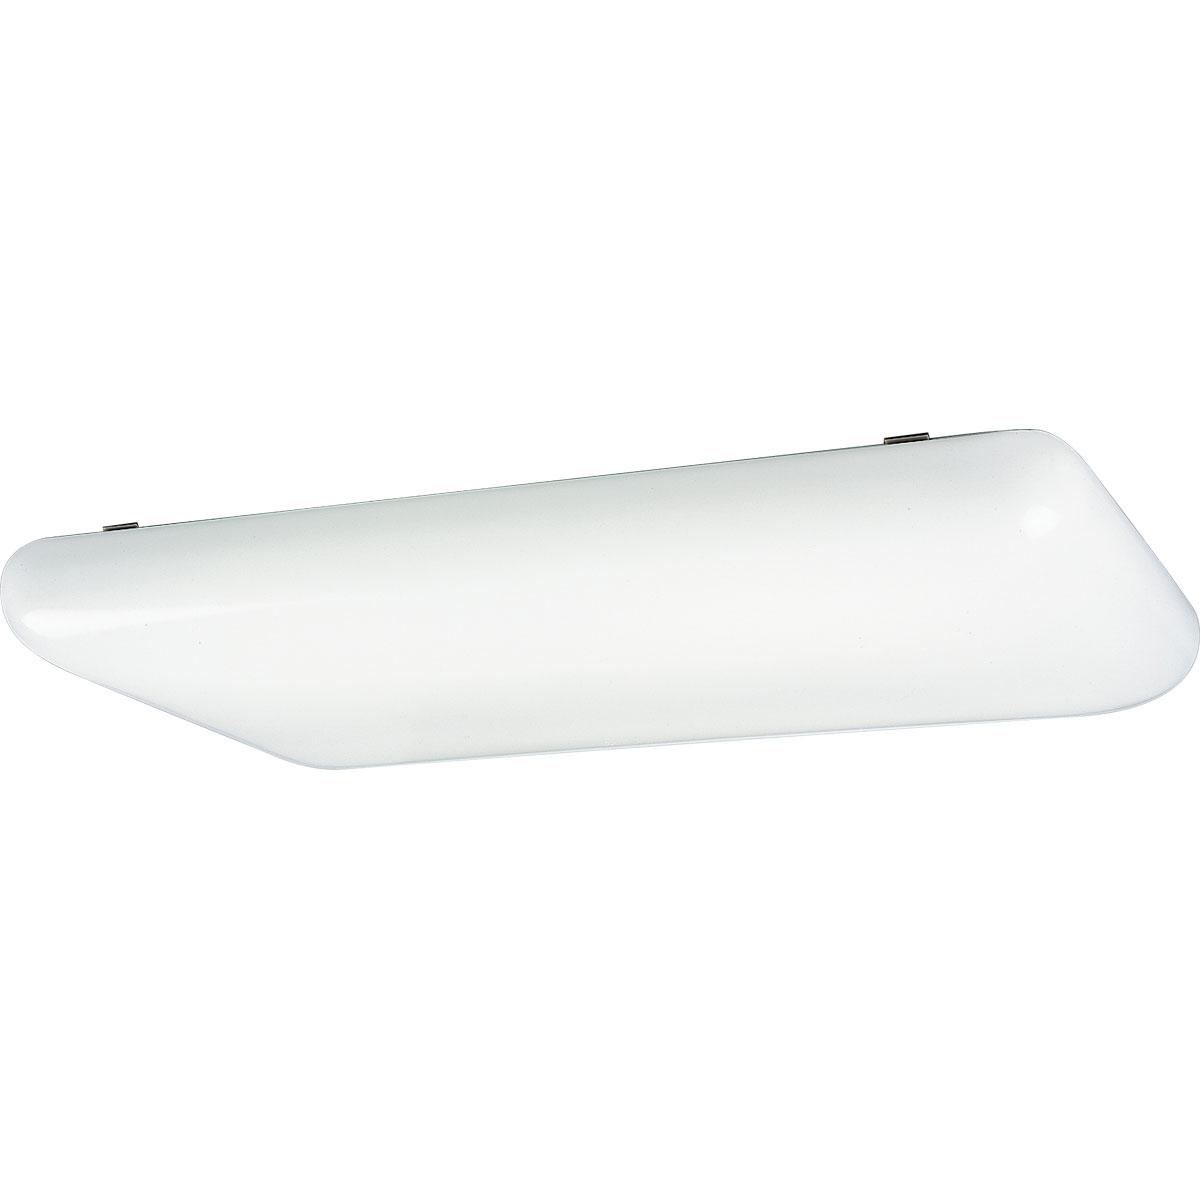 PRO P7280-60EB Four Light White Acrylic Cloud Fluorescent 4XF32T8 -MIM-